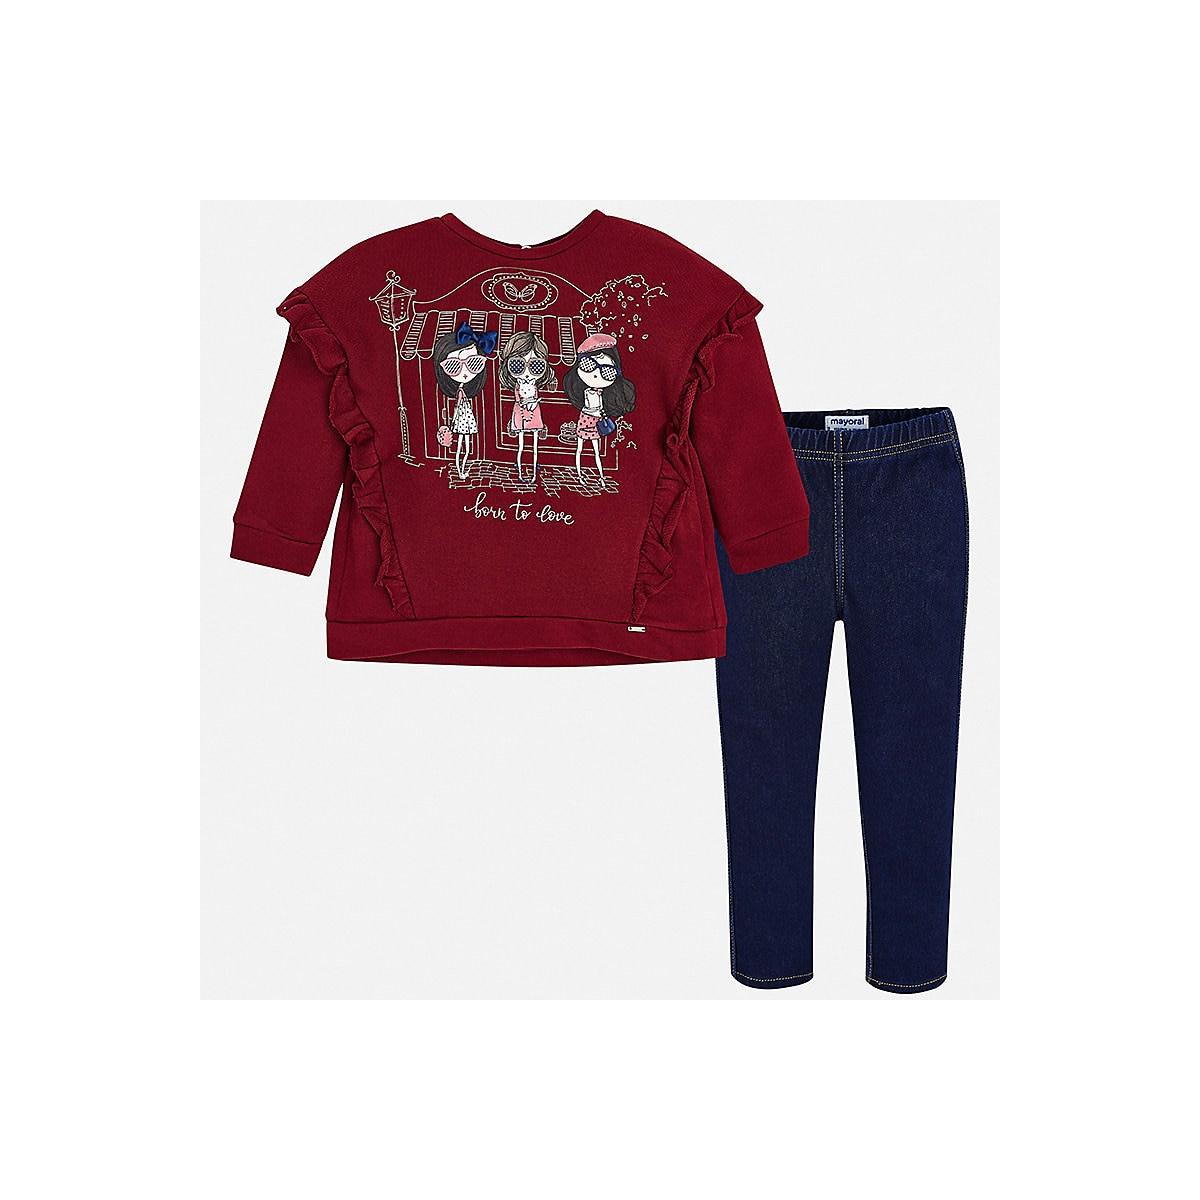 MAYORAL Children's Sets 8848772 Cotton Girls Fashion clothing costume for girl leggings T-shirt